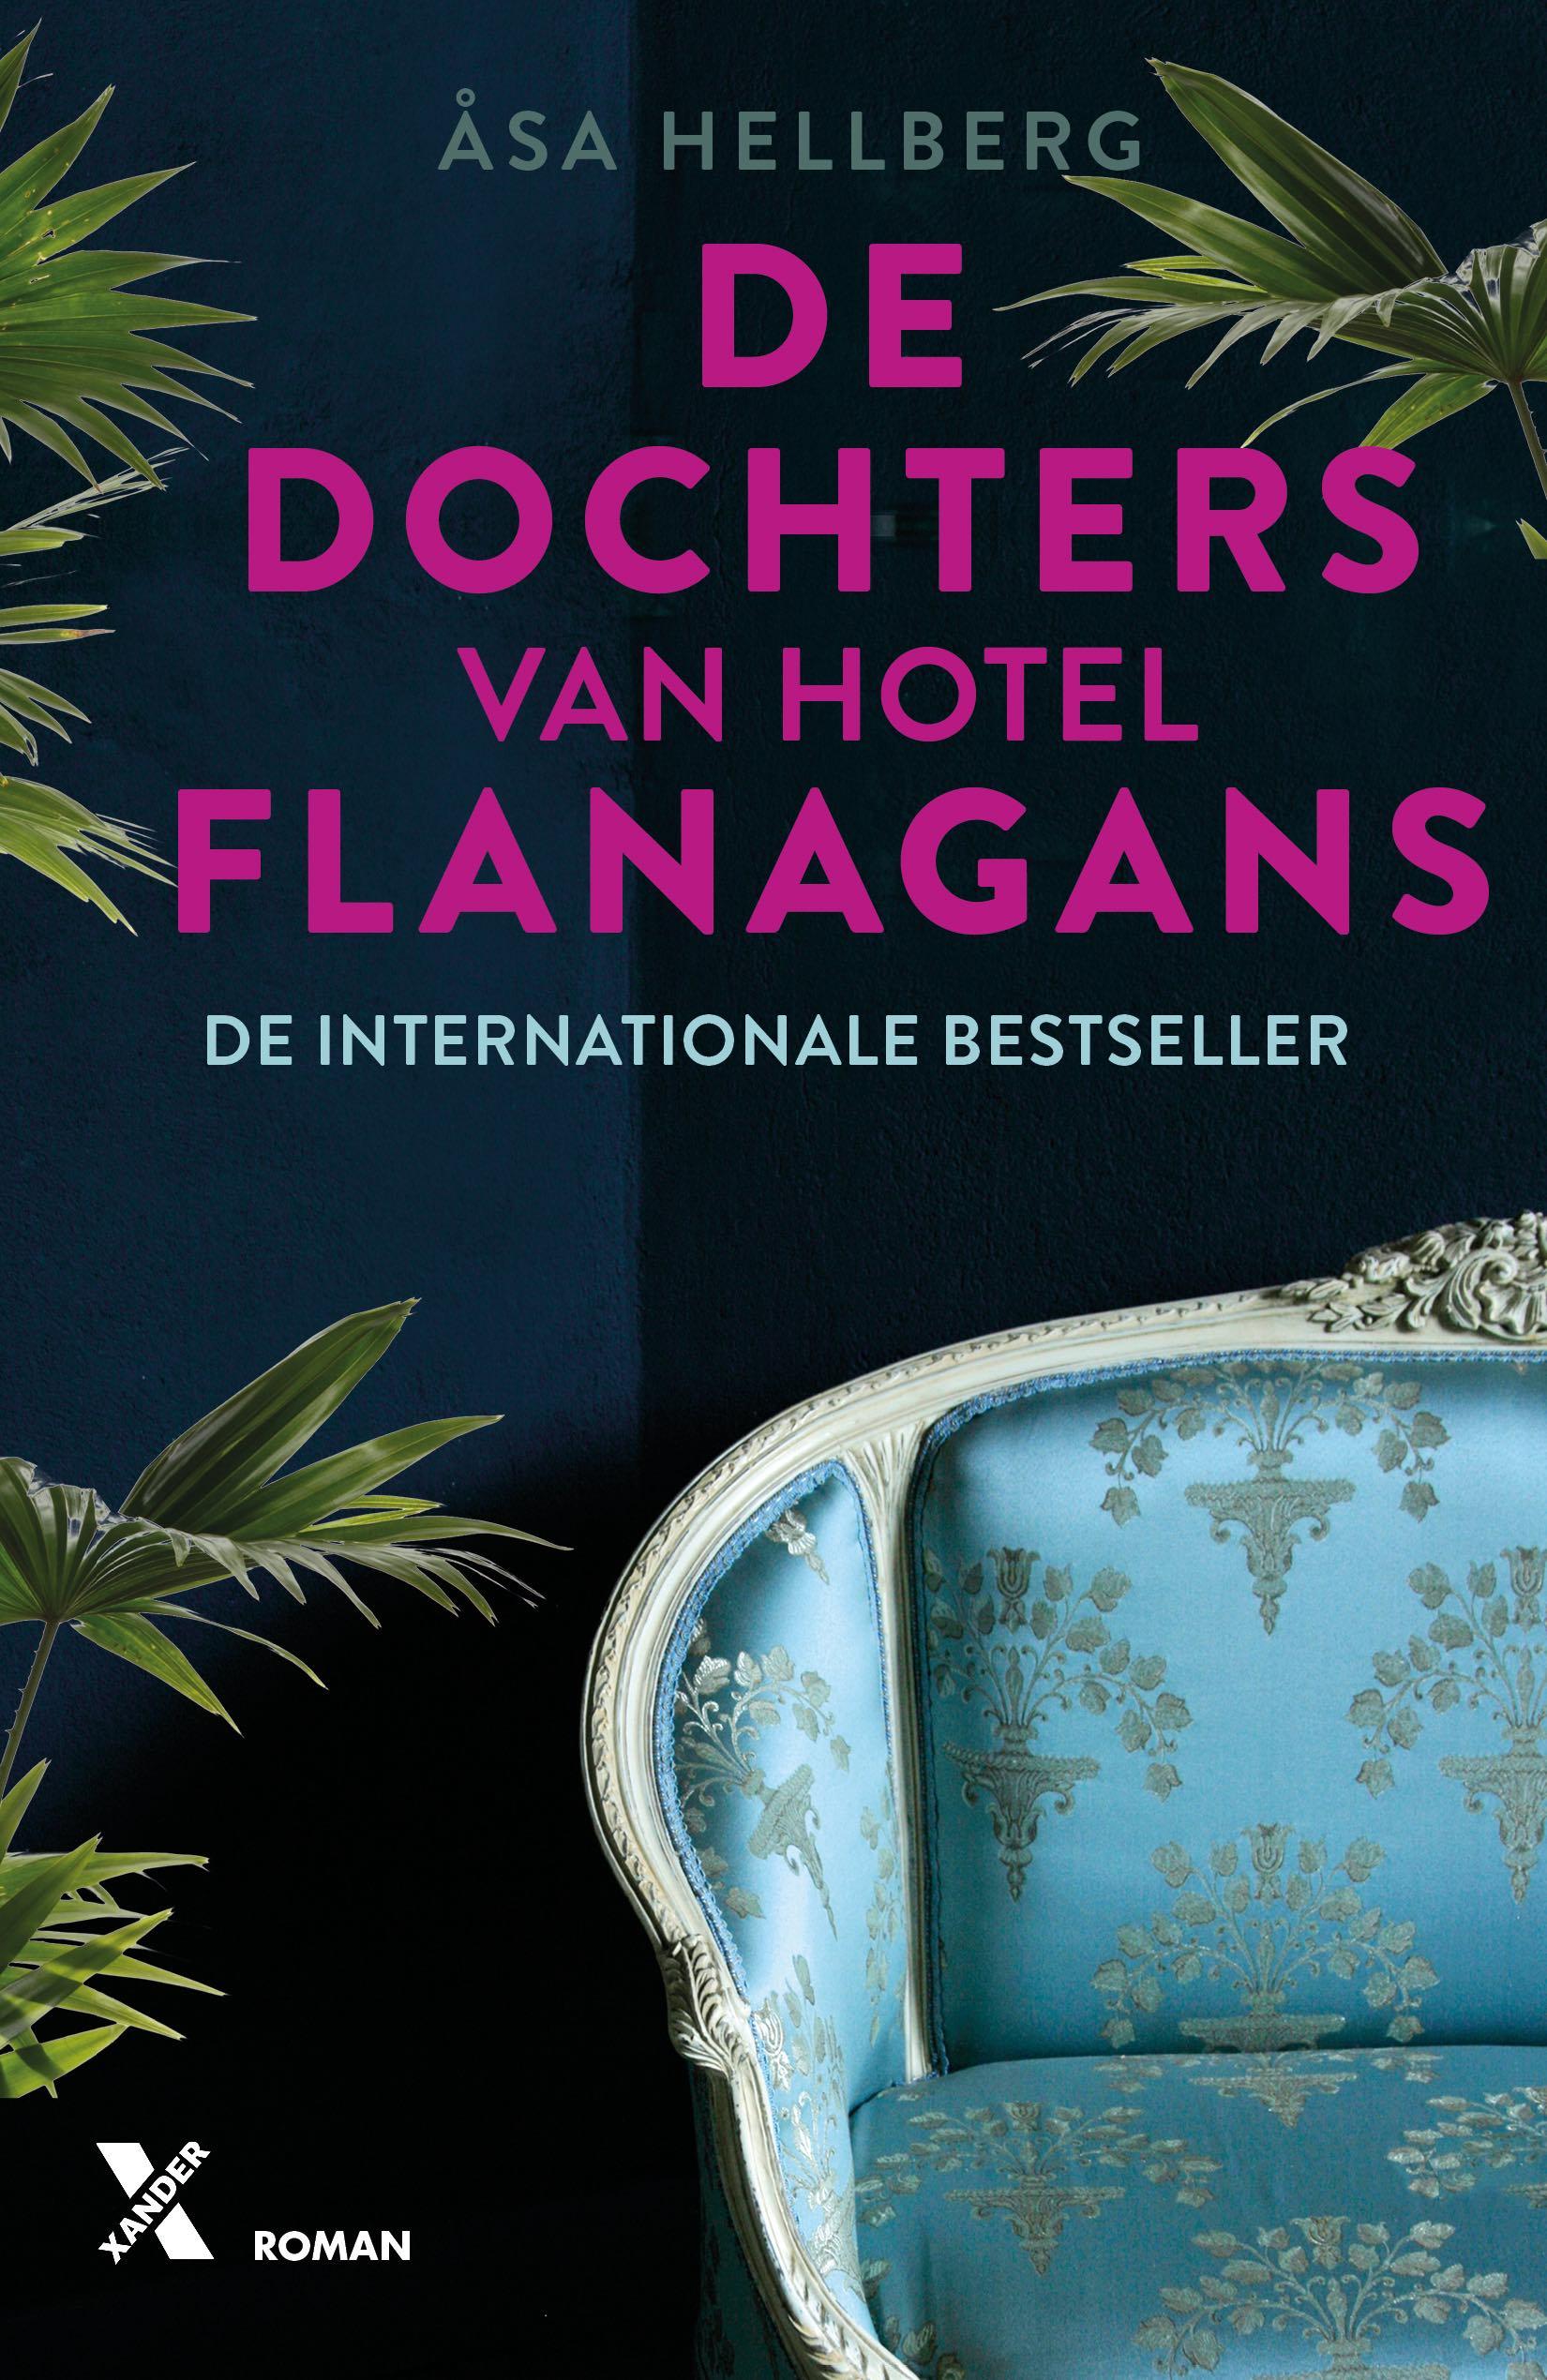 De dochters van Hotel Flanagans_2D